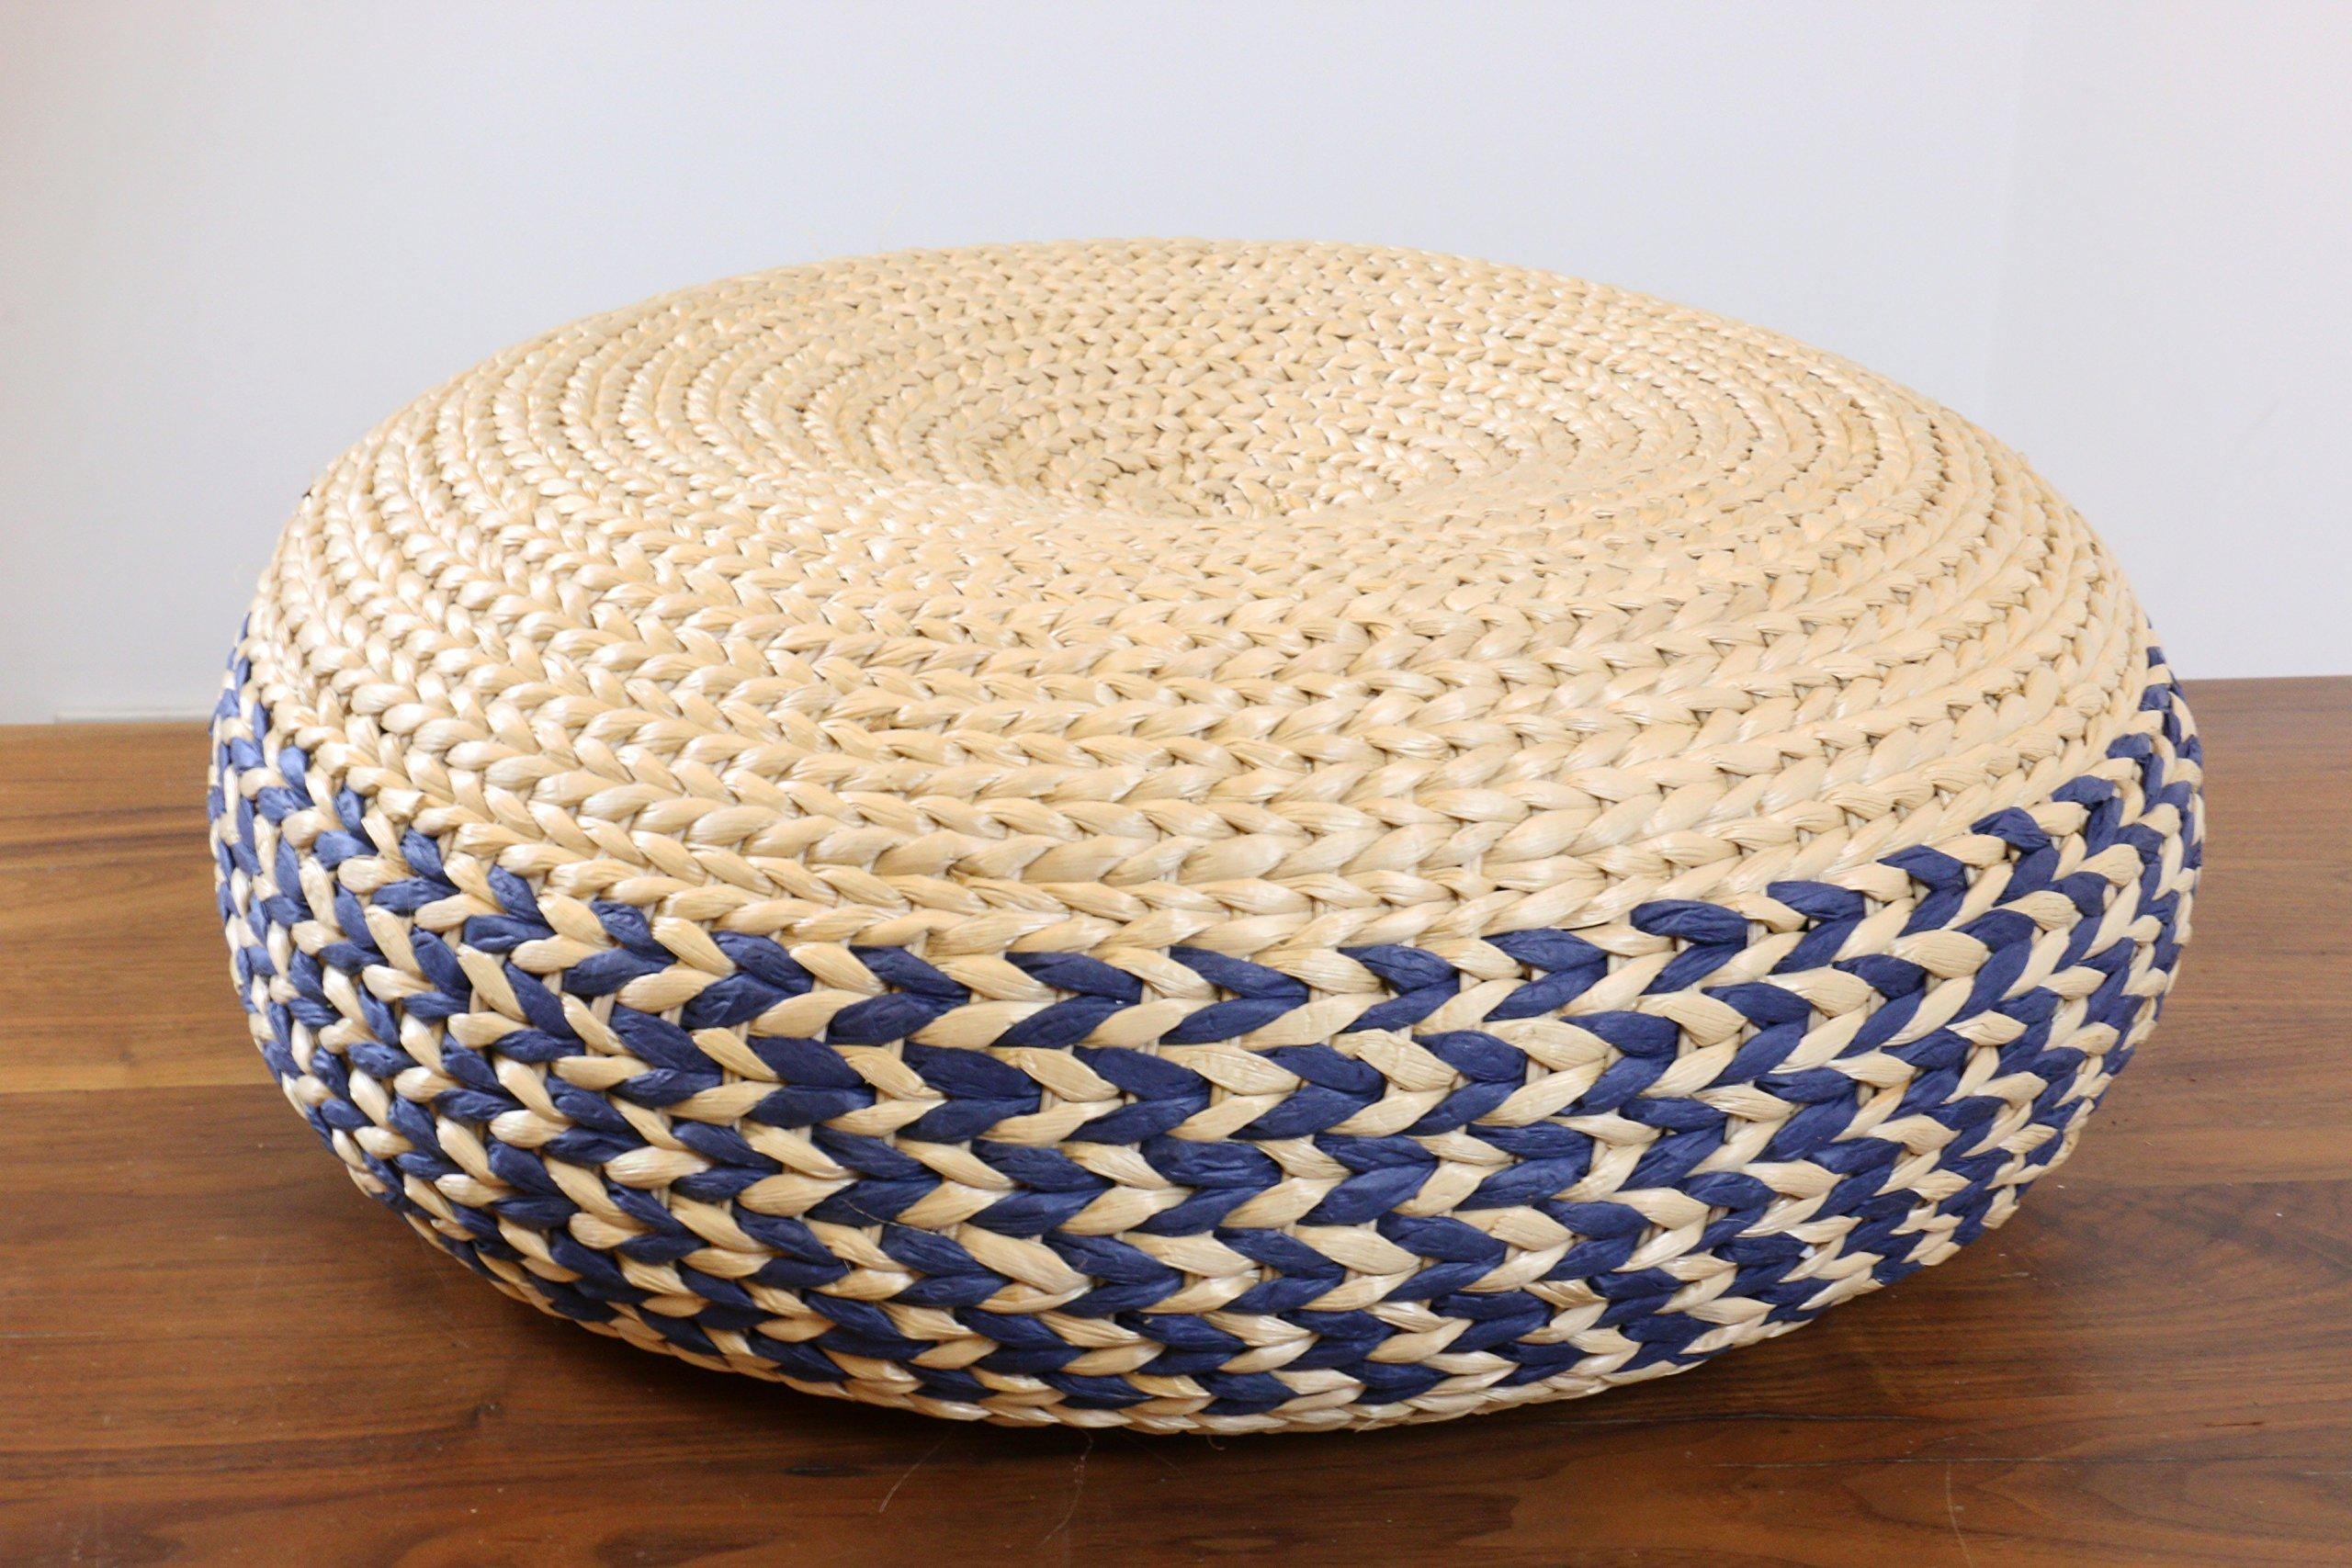 Double colored straw rustic poof/Floor cushion/Pouf ottoman/Wholesales bulk/Yoga/meditation cushion/ wedding gift/Country decor